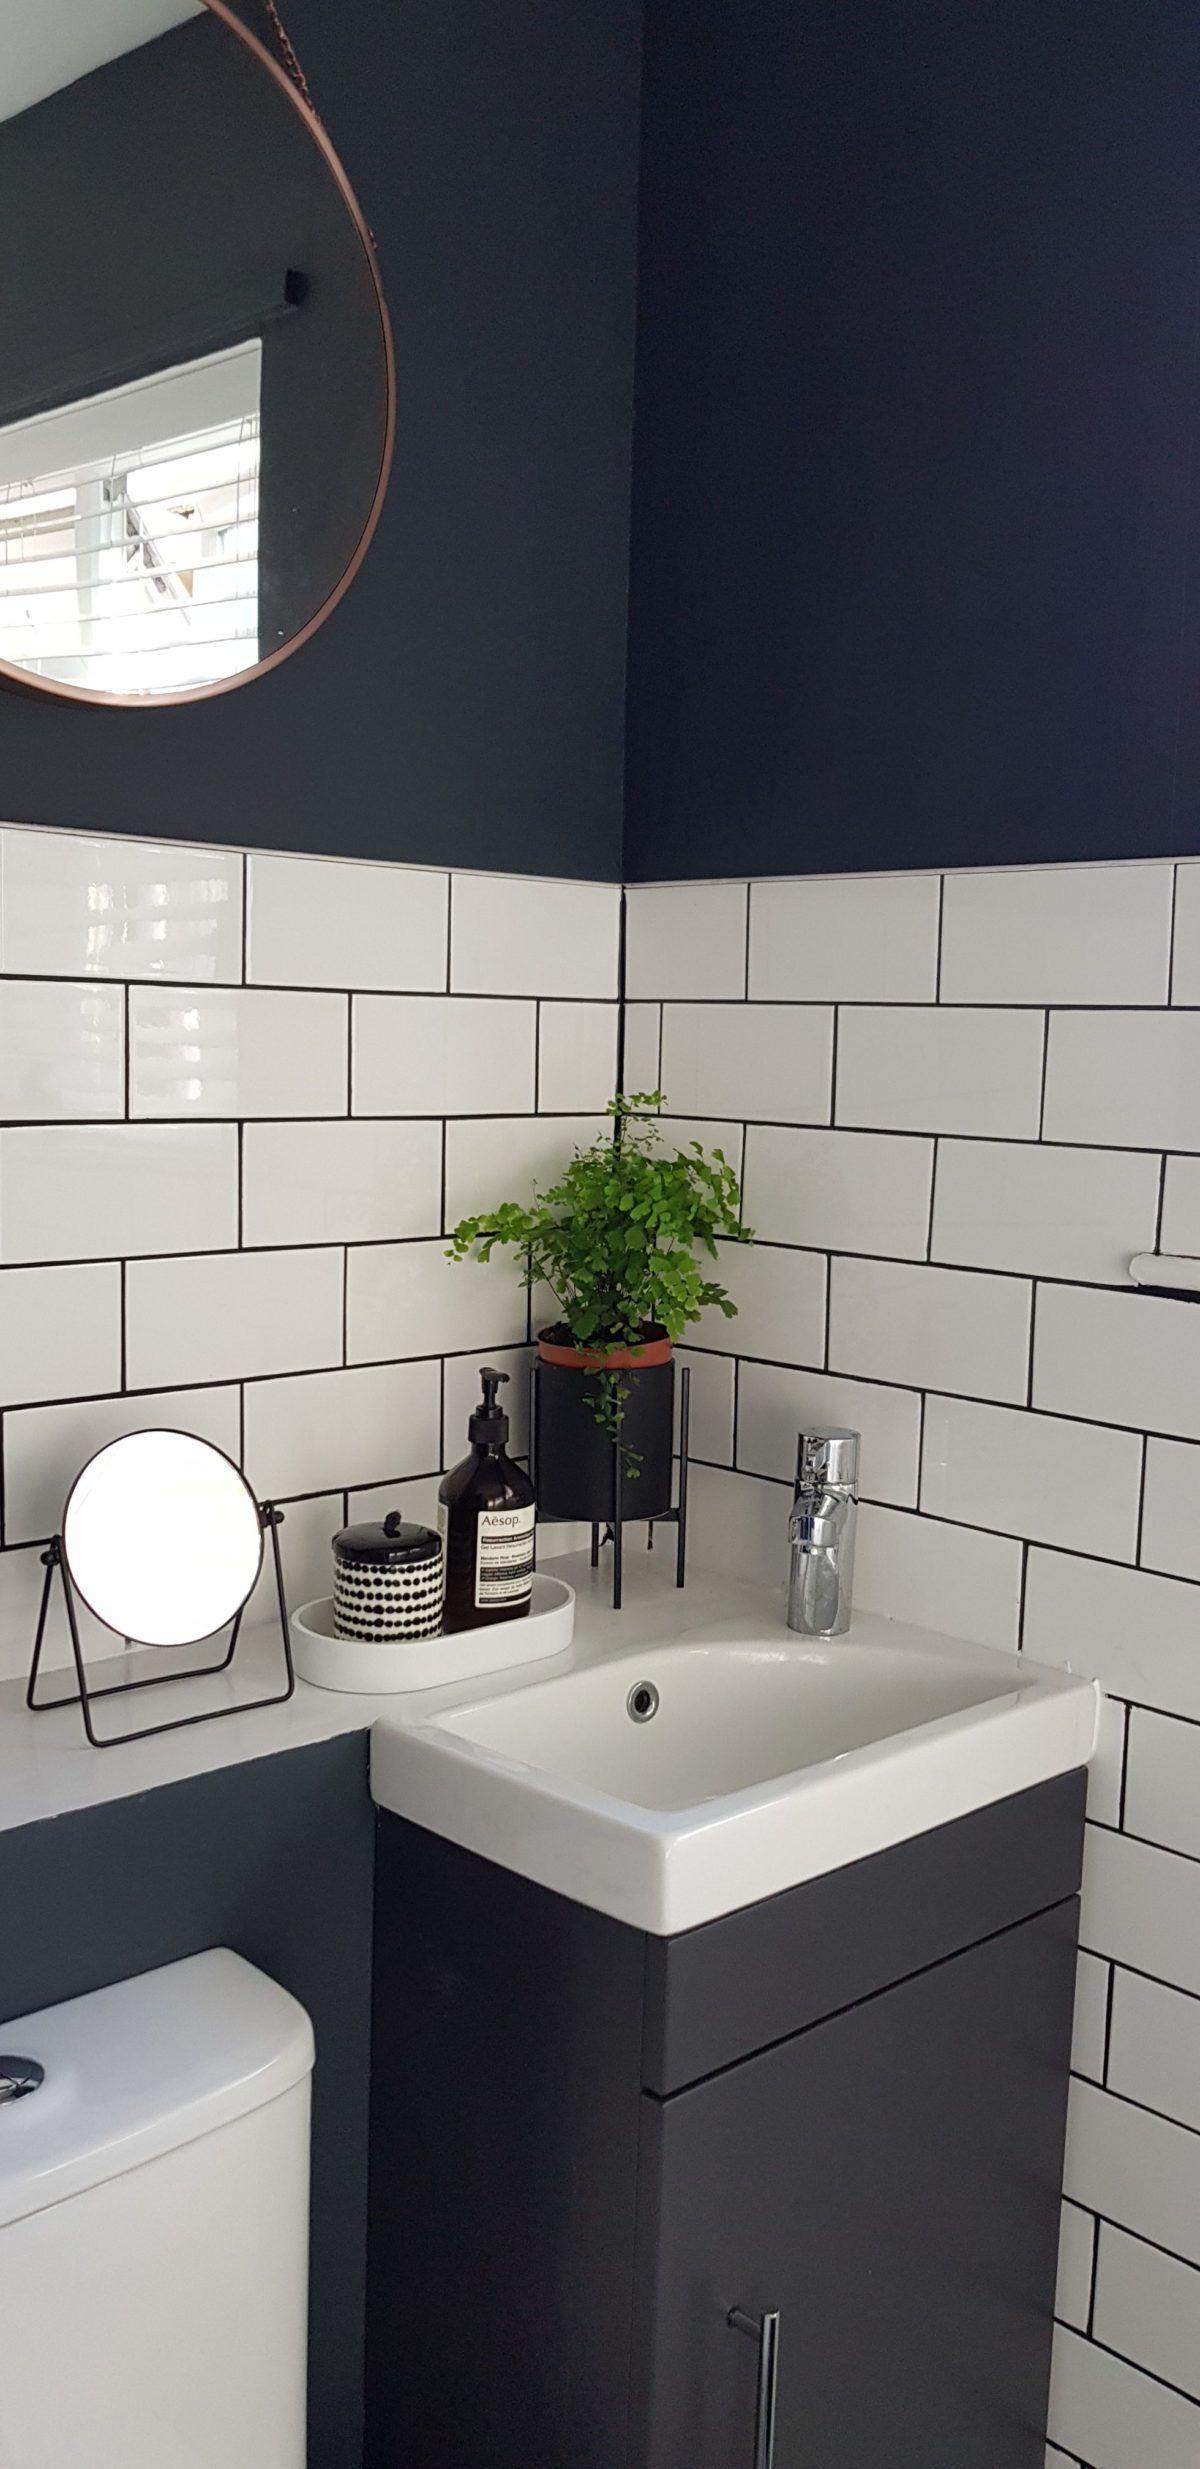 bathroom topps tiles matrix tile bathroom update on bathroom renovation ideas diy id=62127